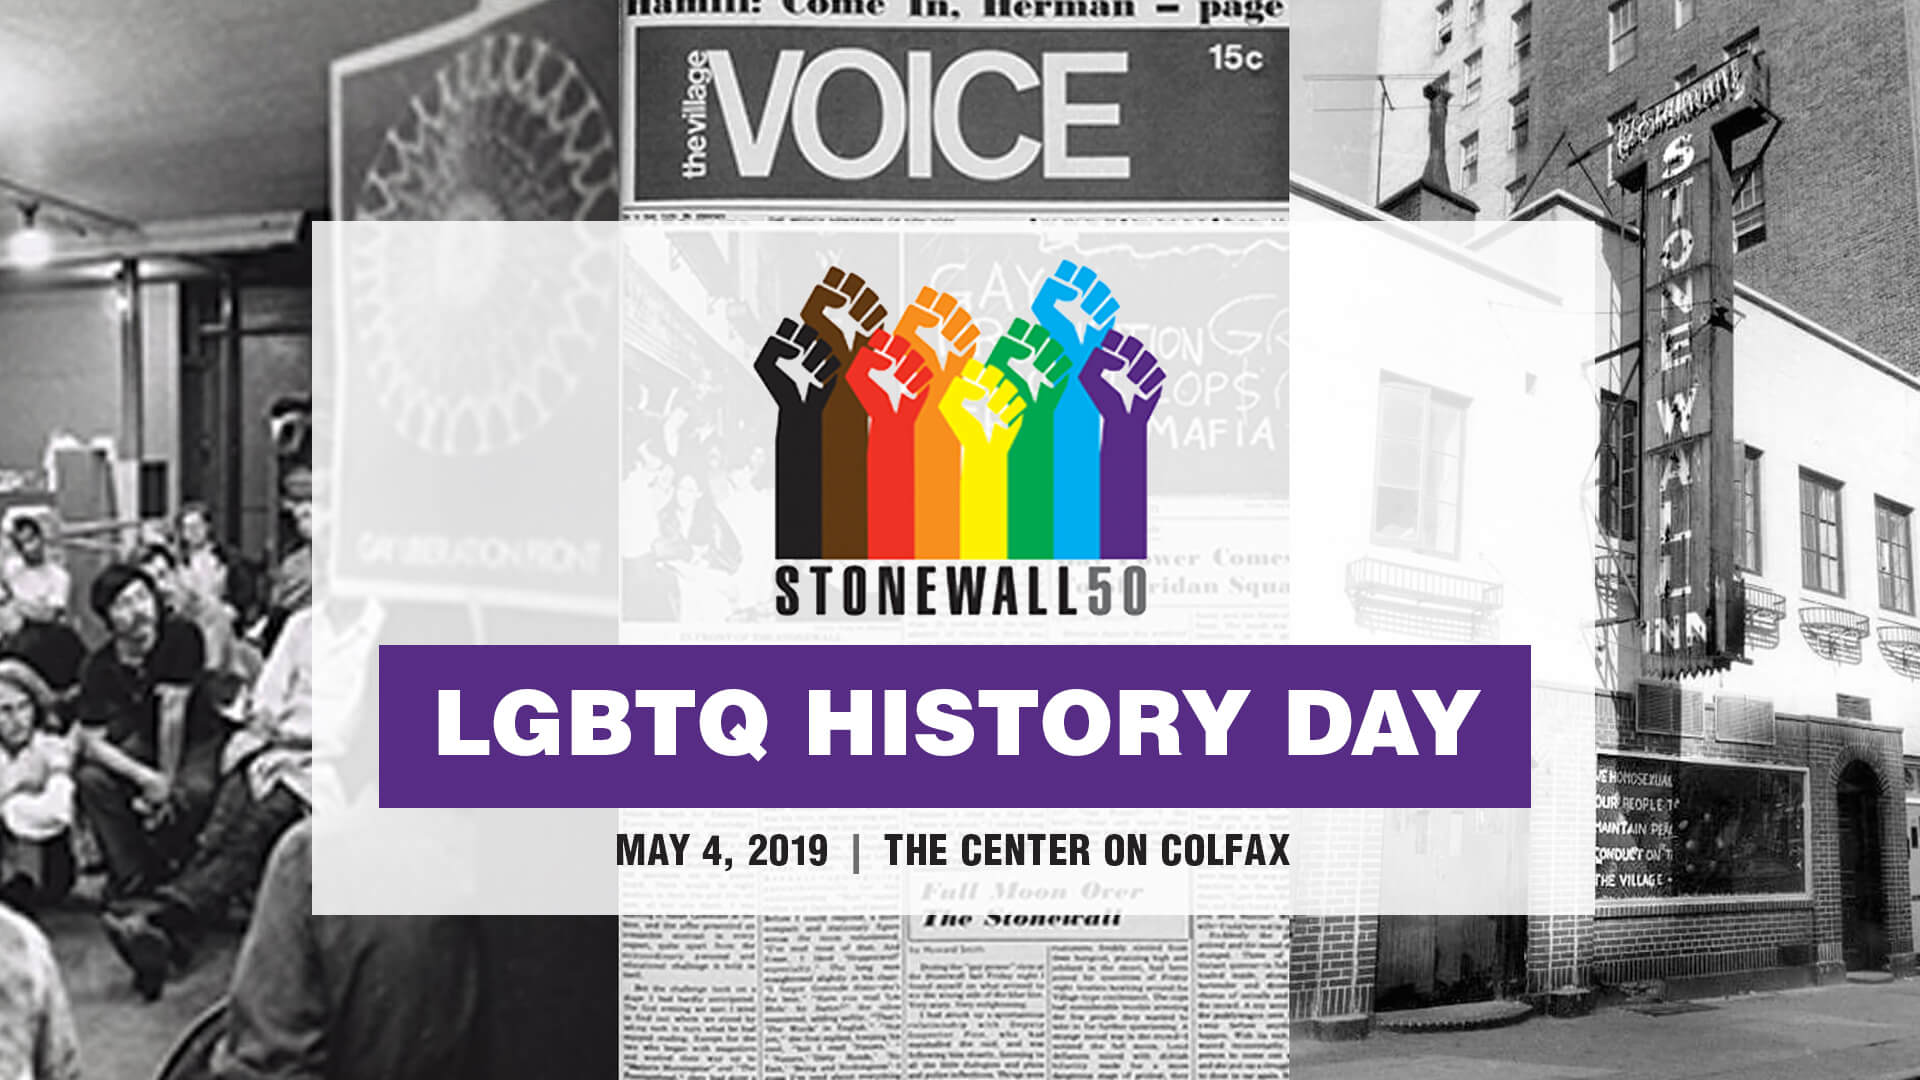 Stonewall 50 LGBTQ History Day